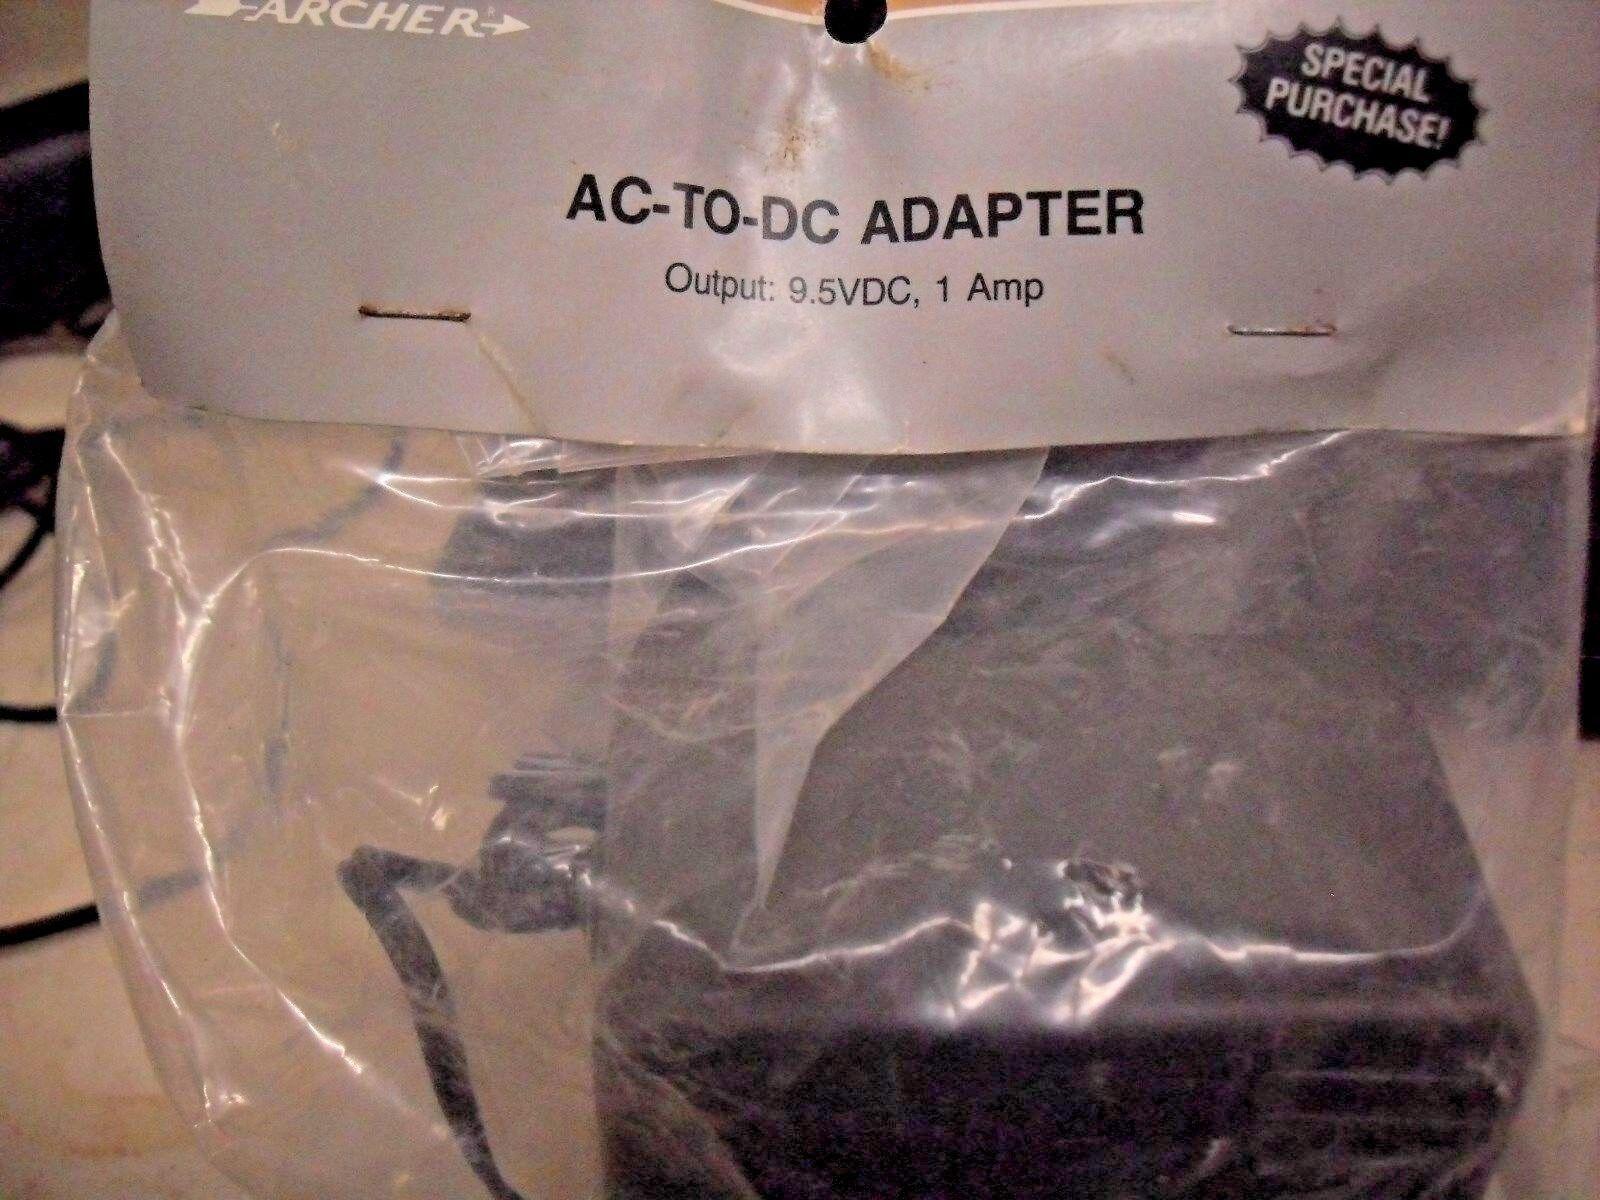 ARCHER 273-1026 Power Adapter Radio Shack Speaker Calculators AC 9.5VDC 1 AMP